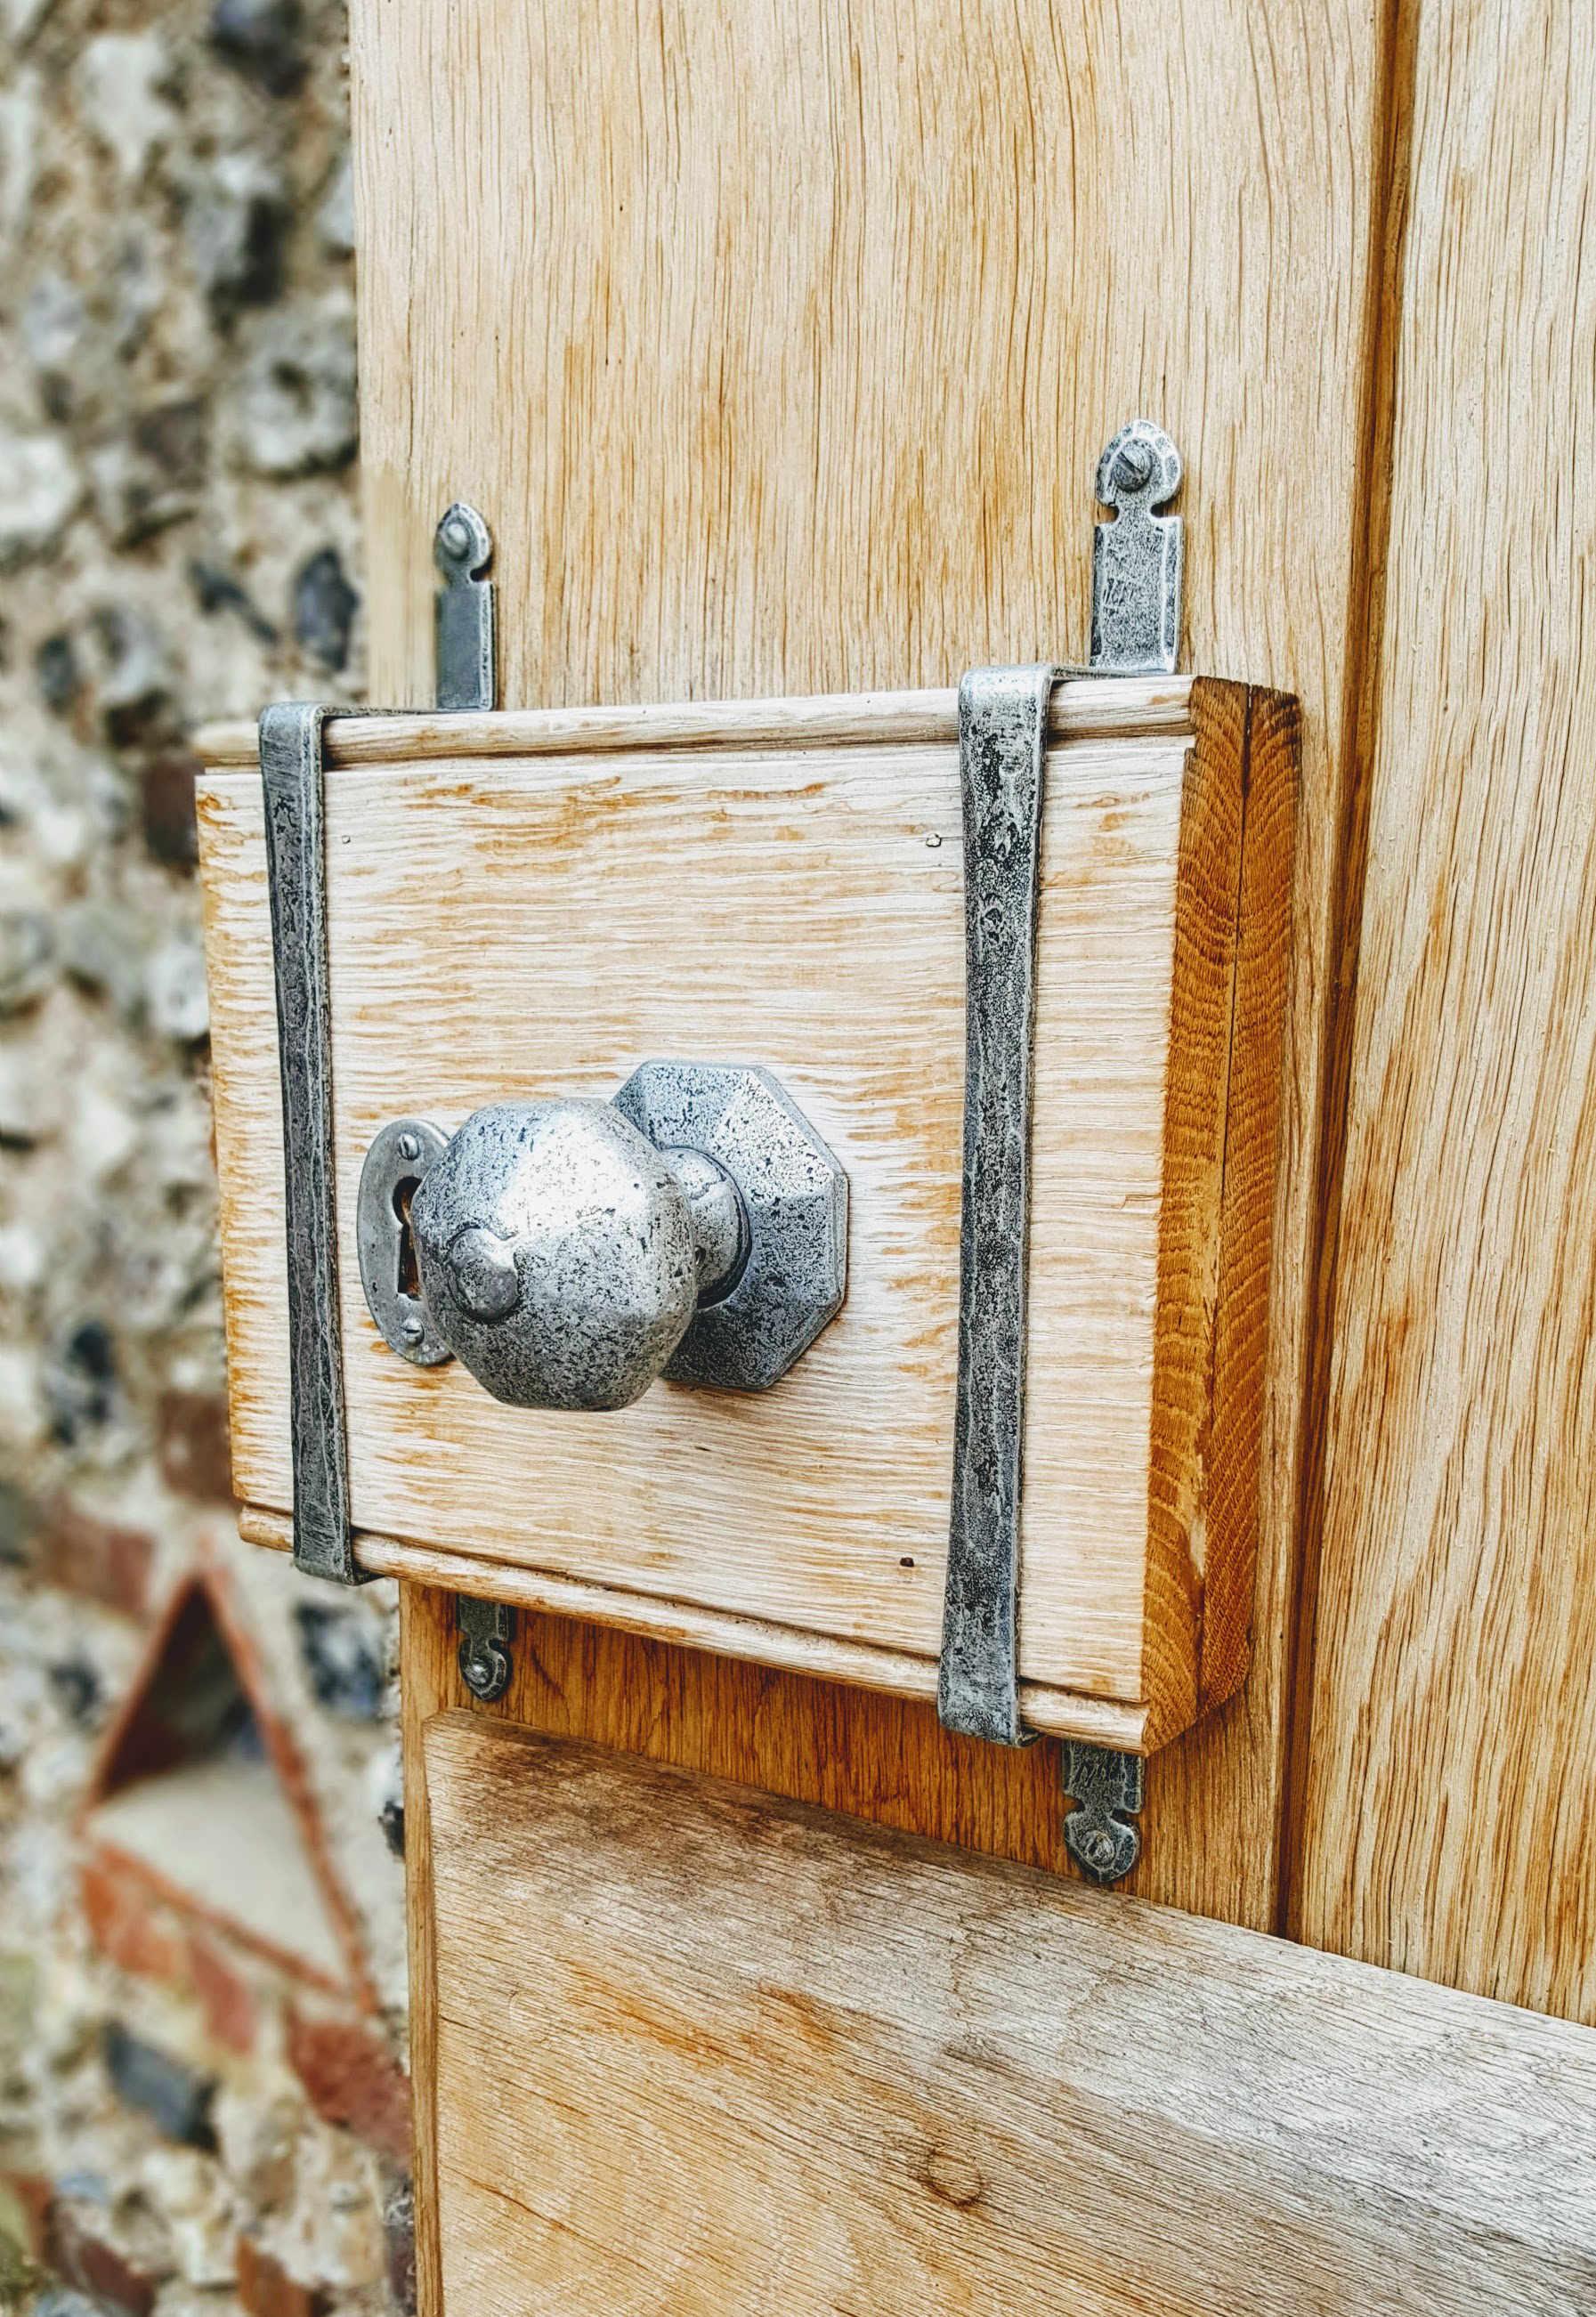 Charleston Barn interior - door handle